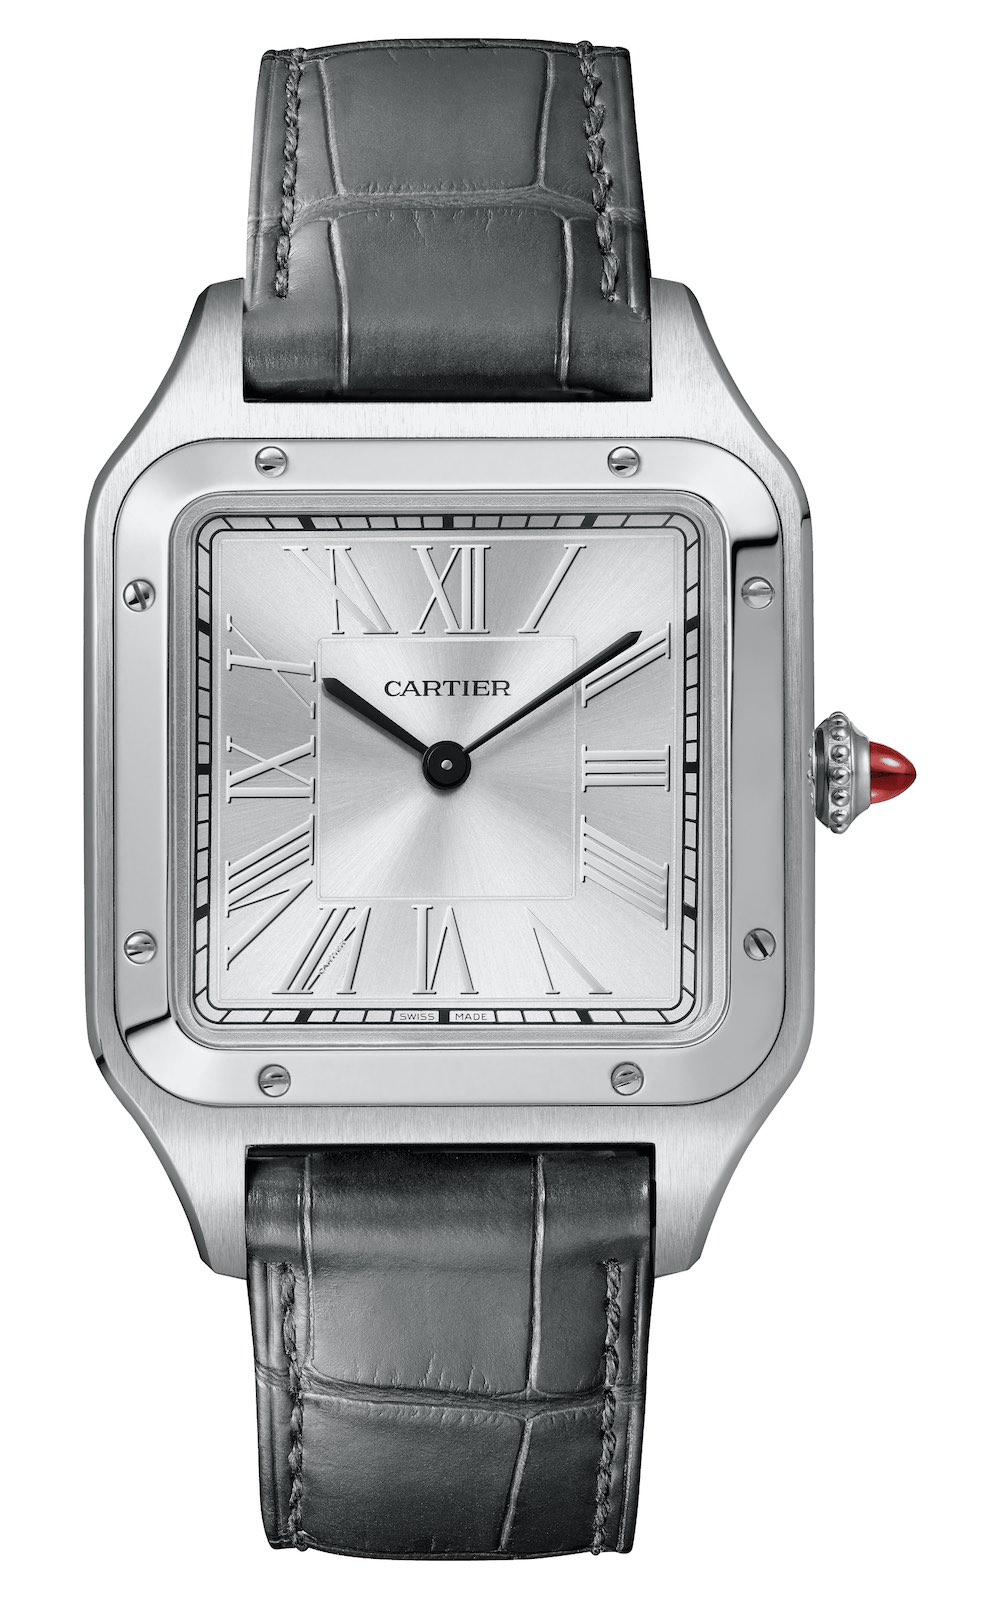 2020 Cartier Santos-Dumont hand-wound limited edition platinum la bresil WGSA0034 - 2